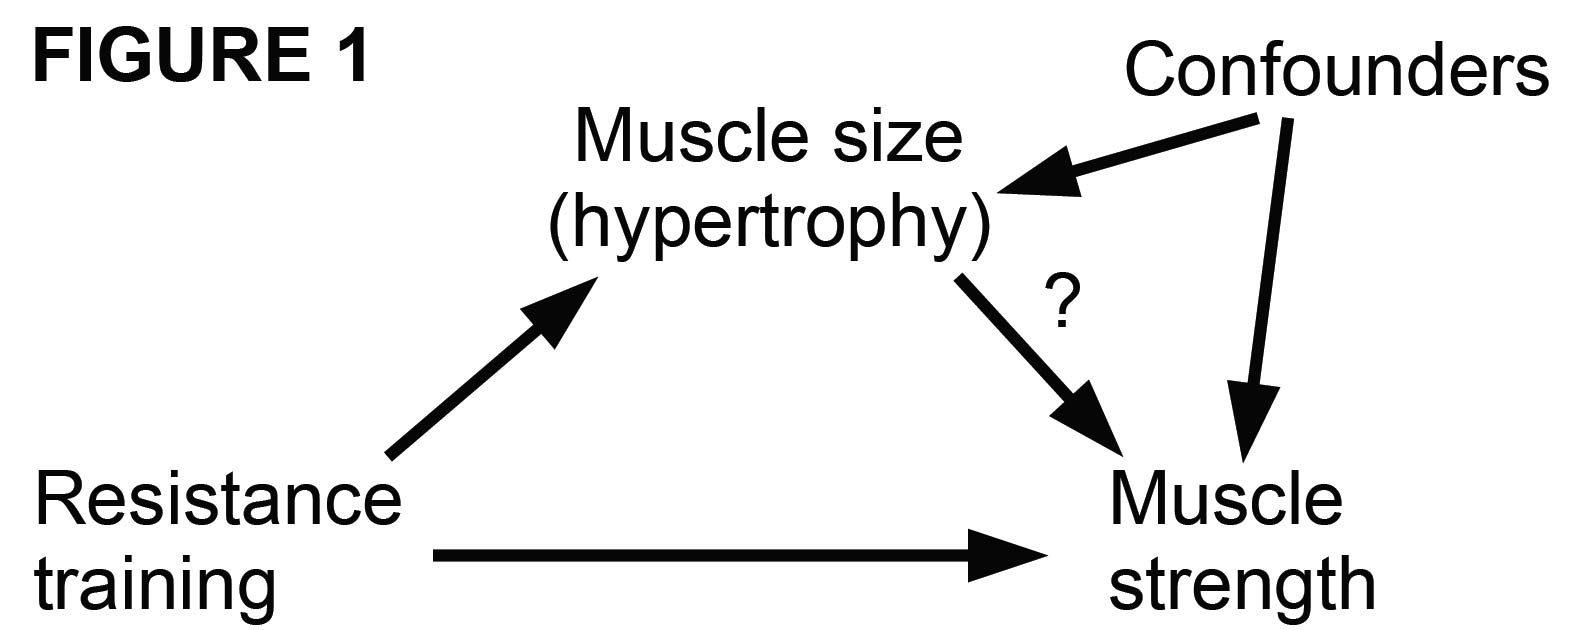 The debate on muscle hypertrophy - Motor Impairment